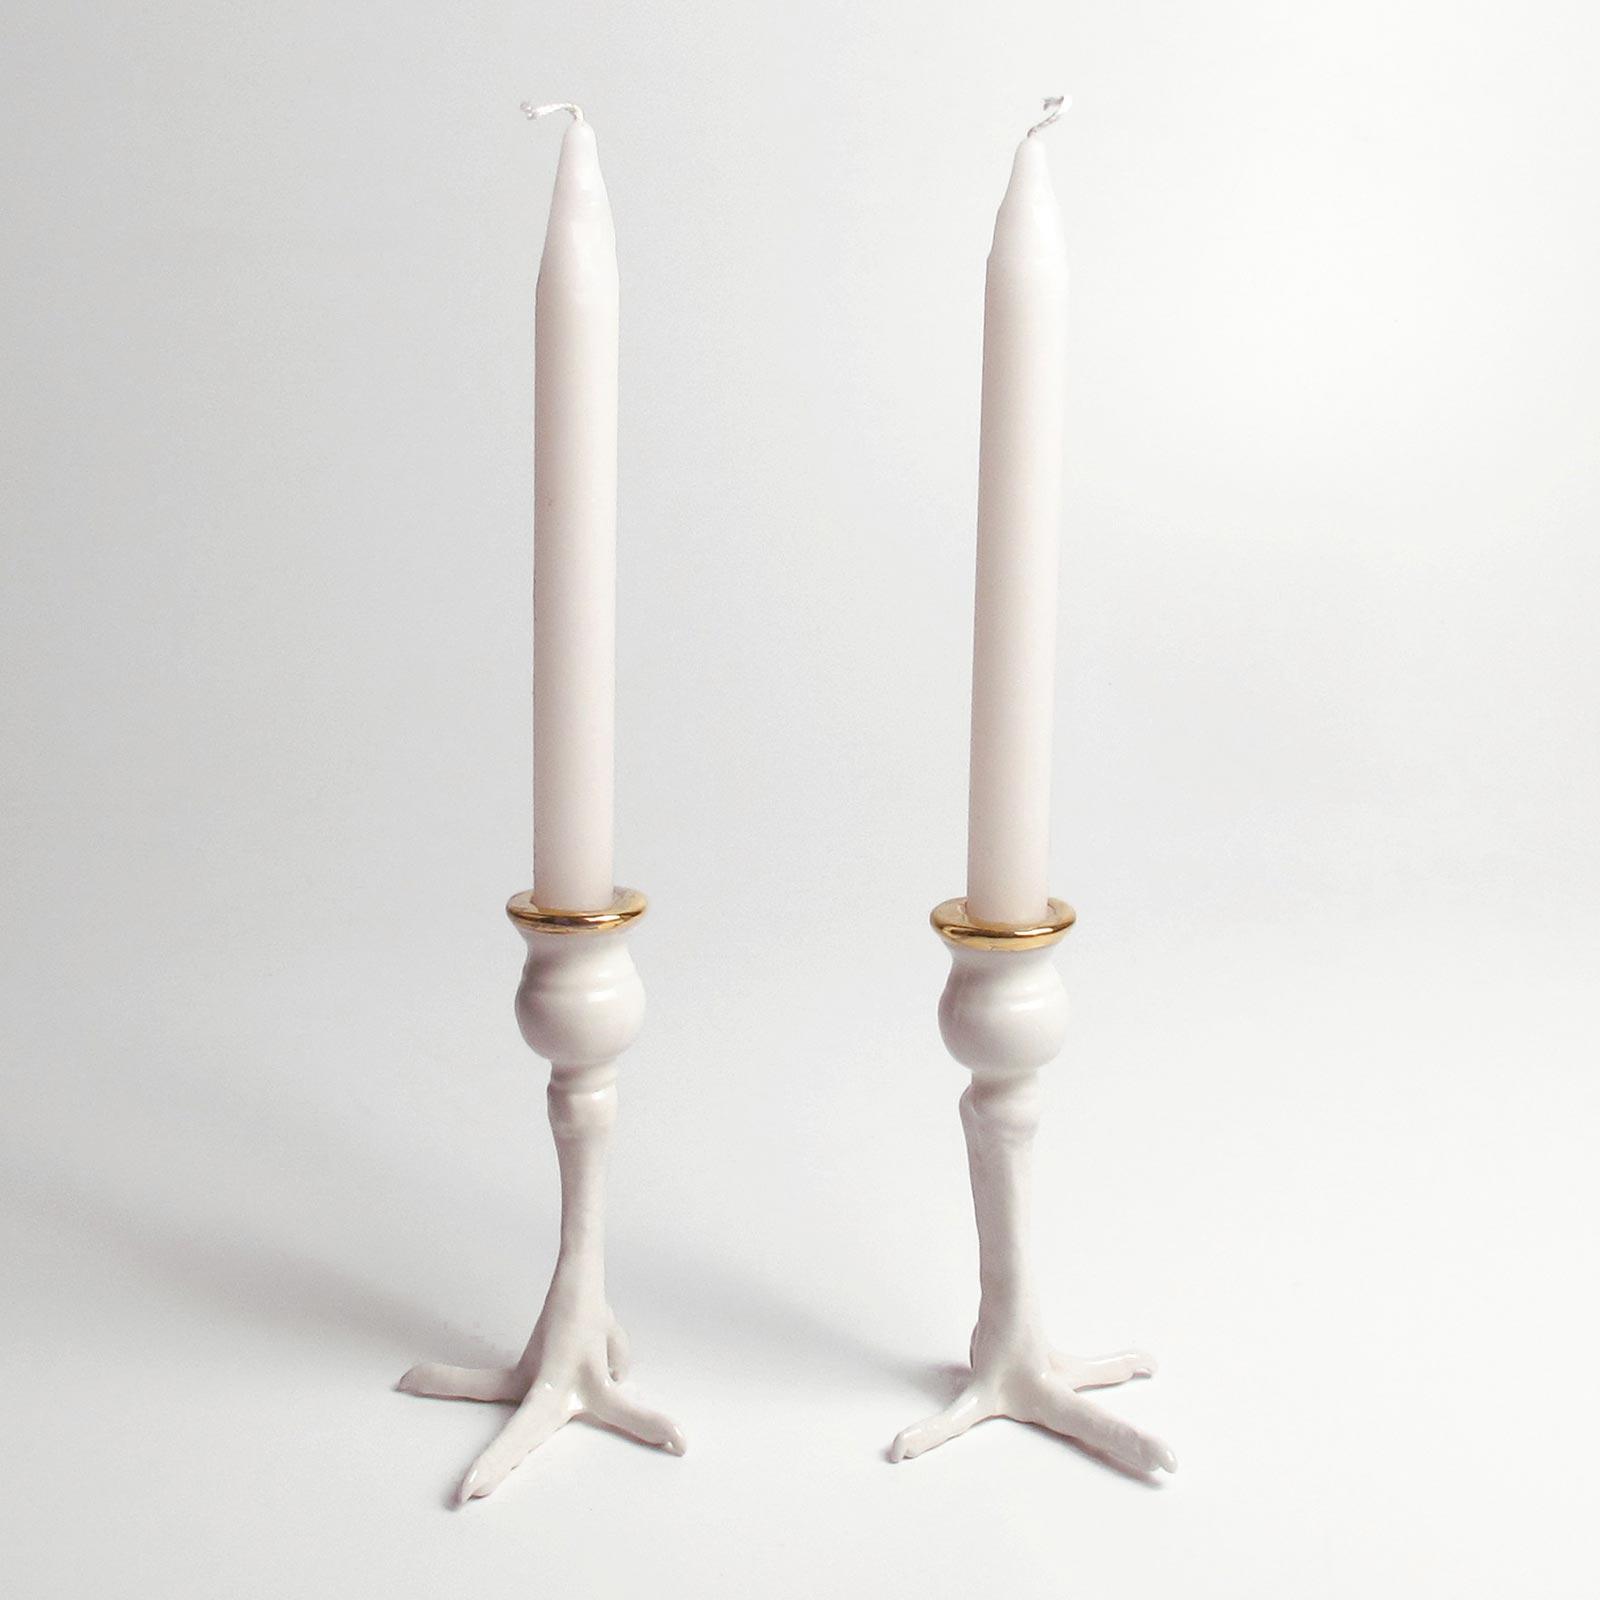 still-life-candelieri-studio17-caterina-sbrana-gabriele-mallegni-0